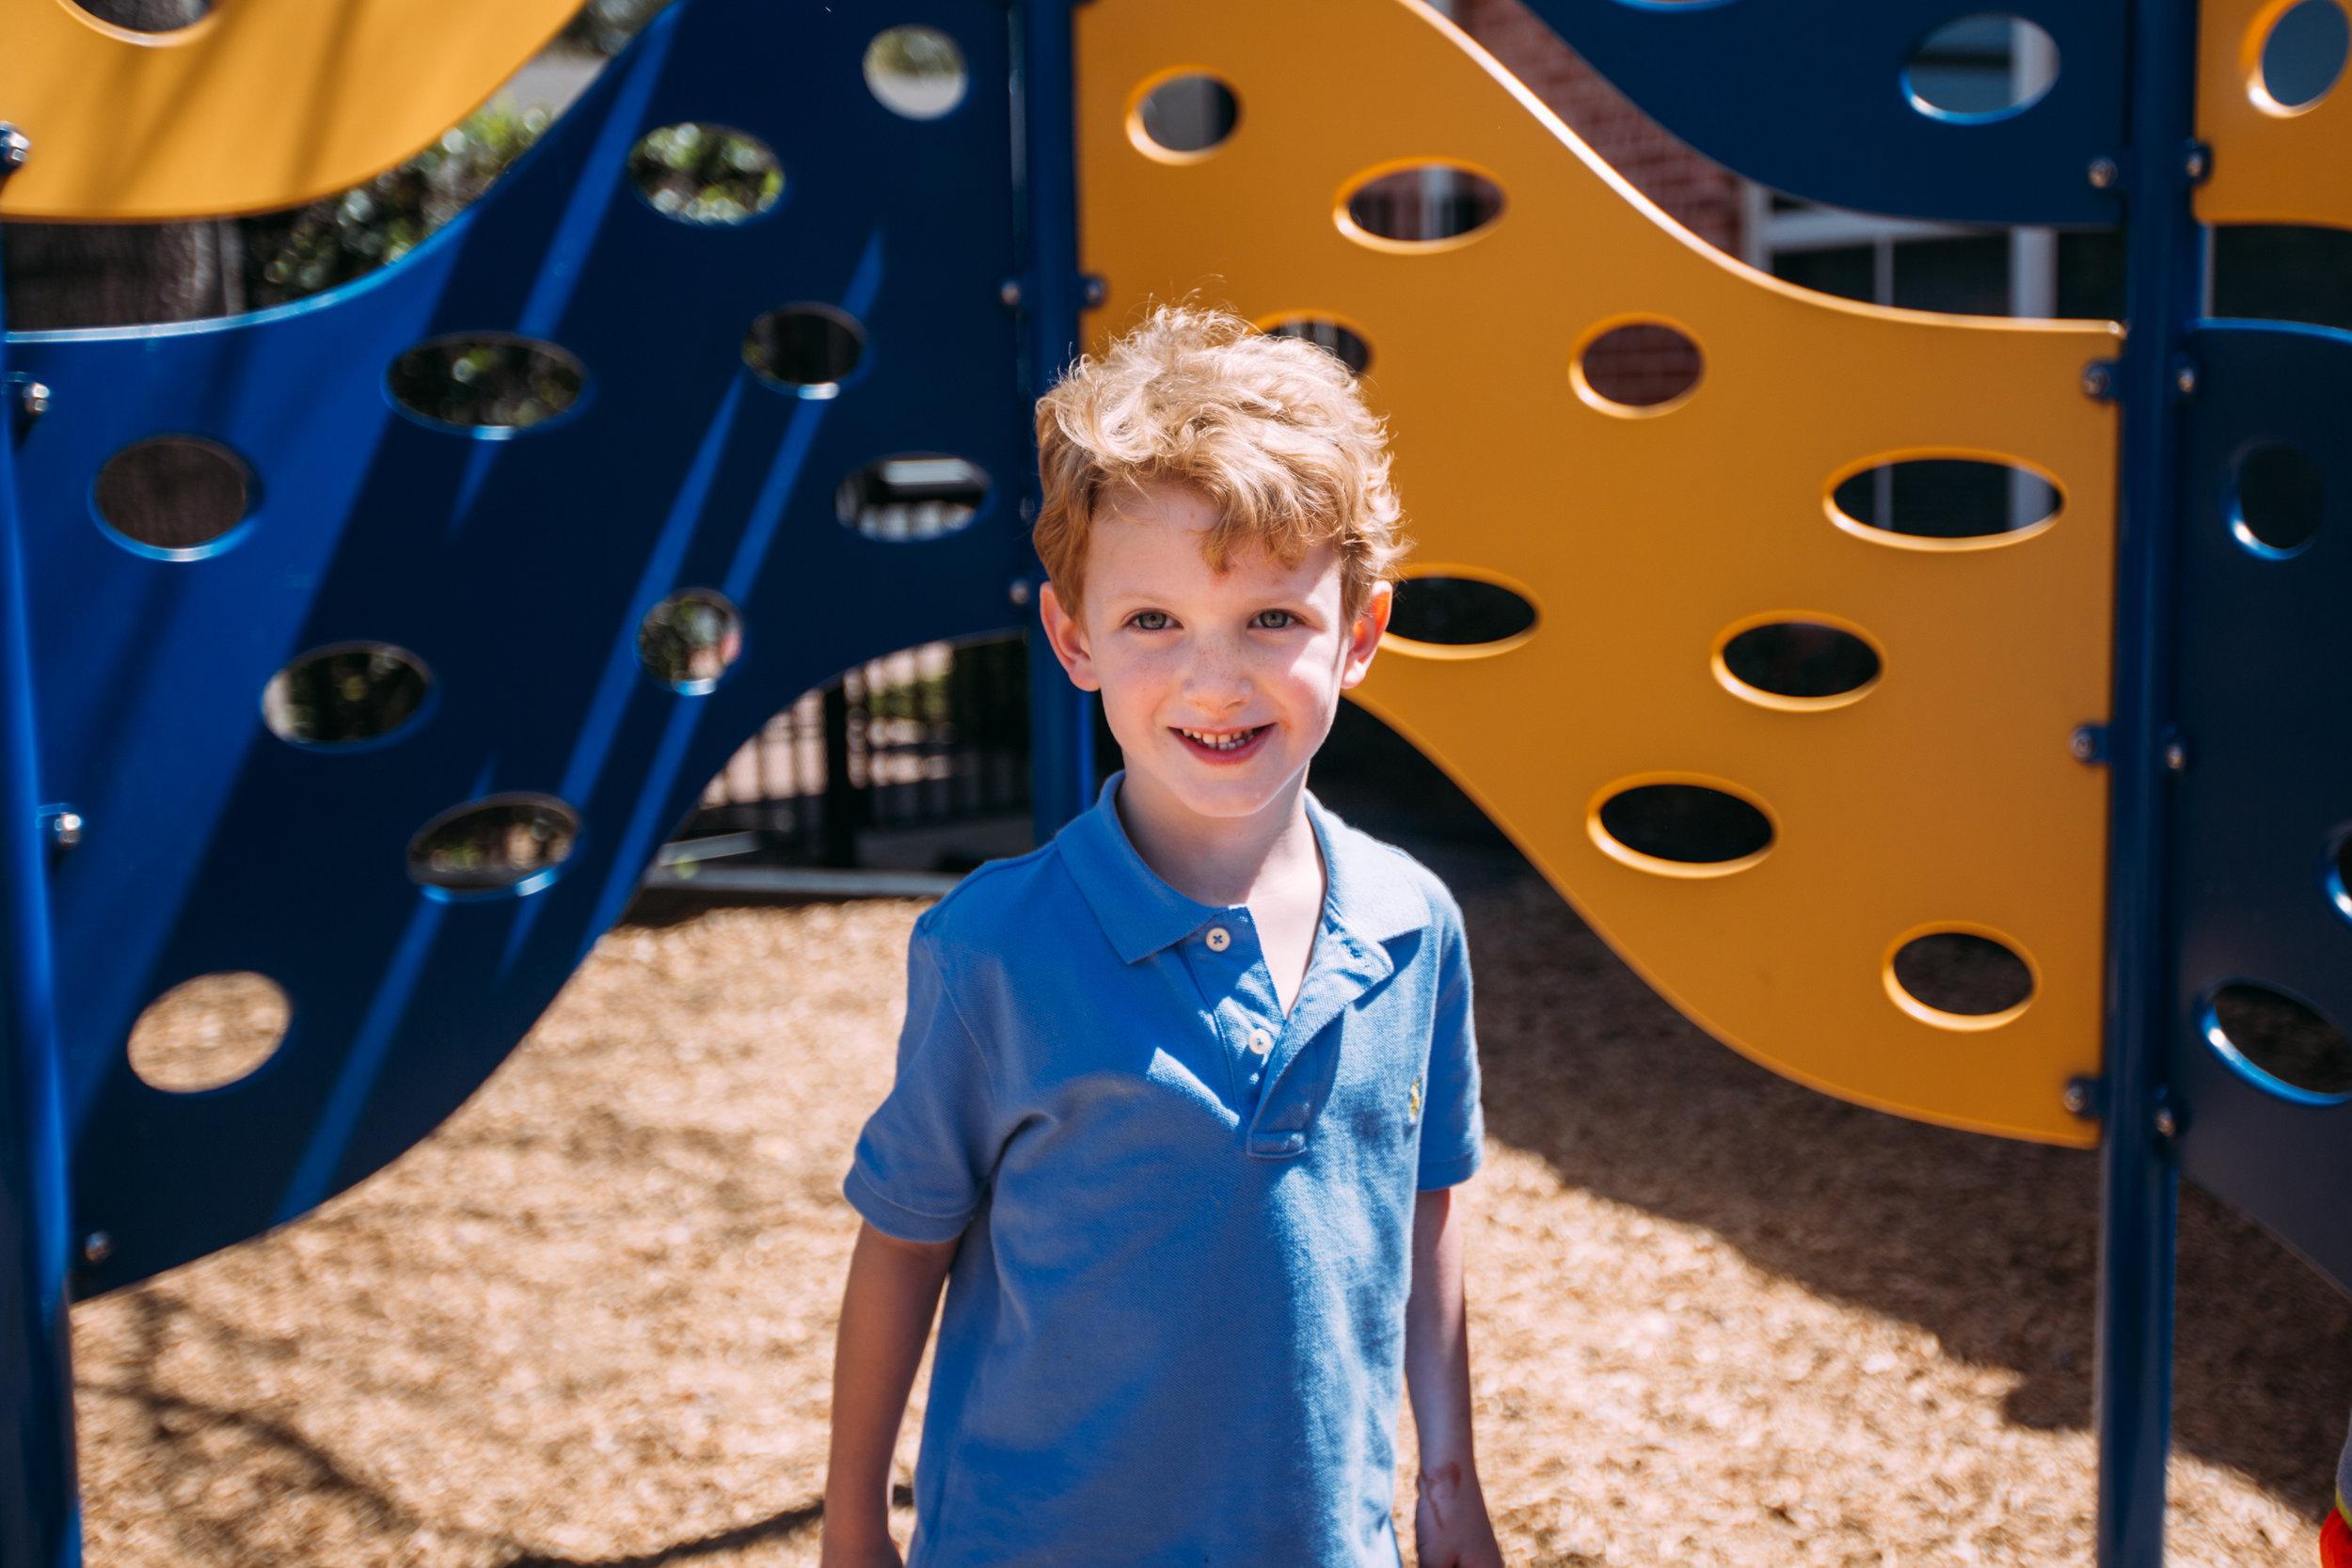 Houston School Photography - PreK River Oaks Baptist School-1-3.jpg